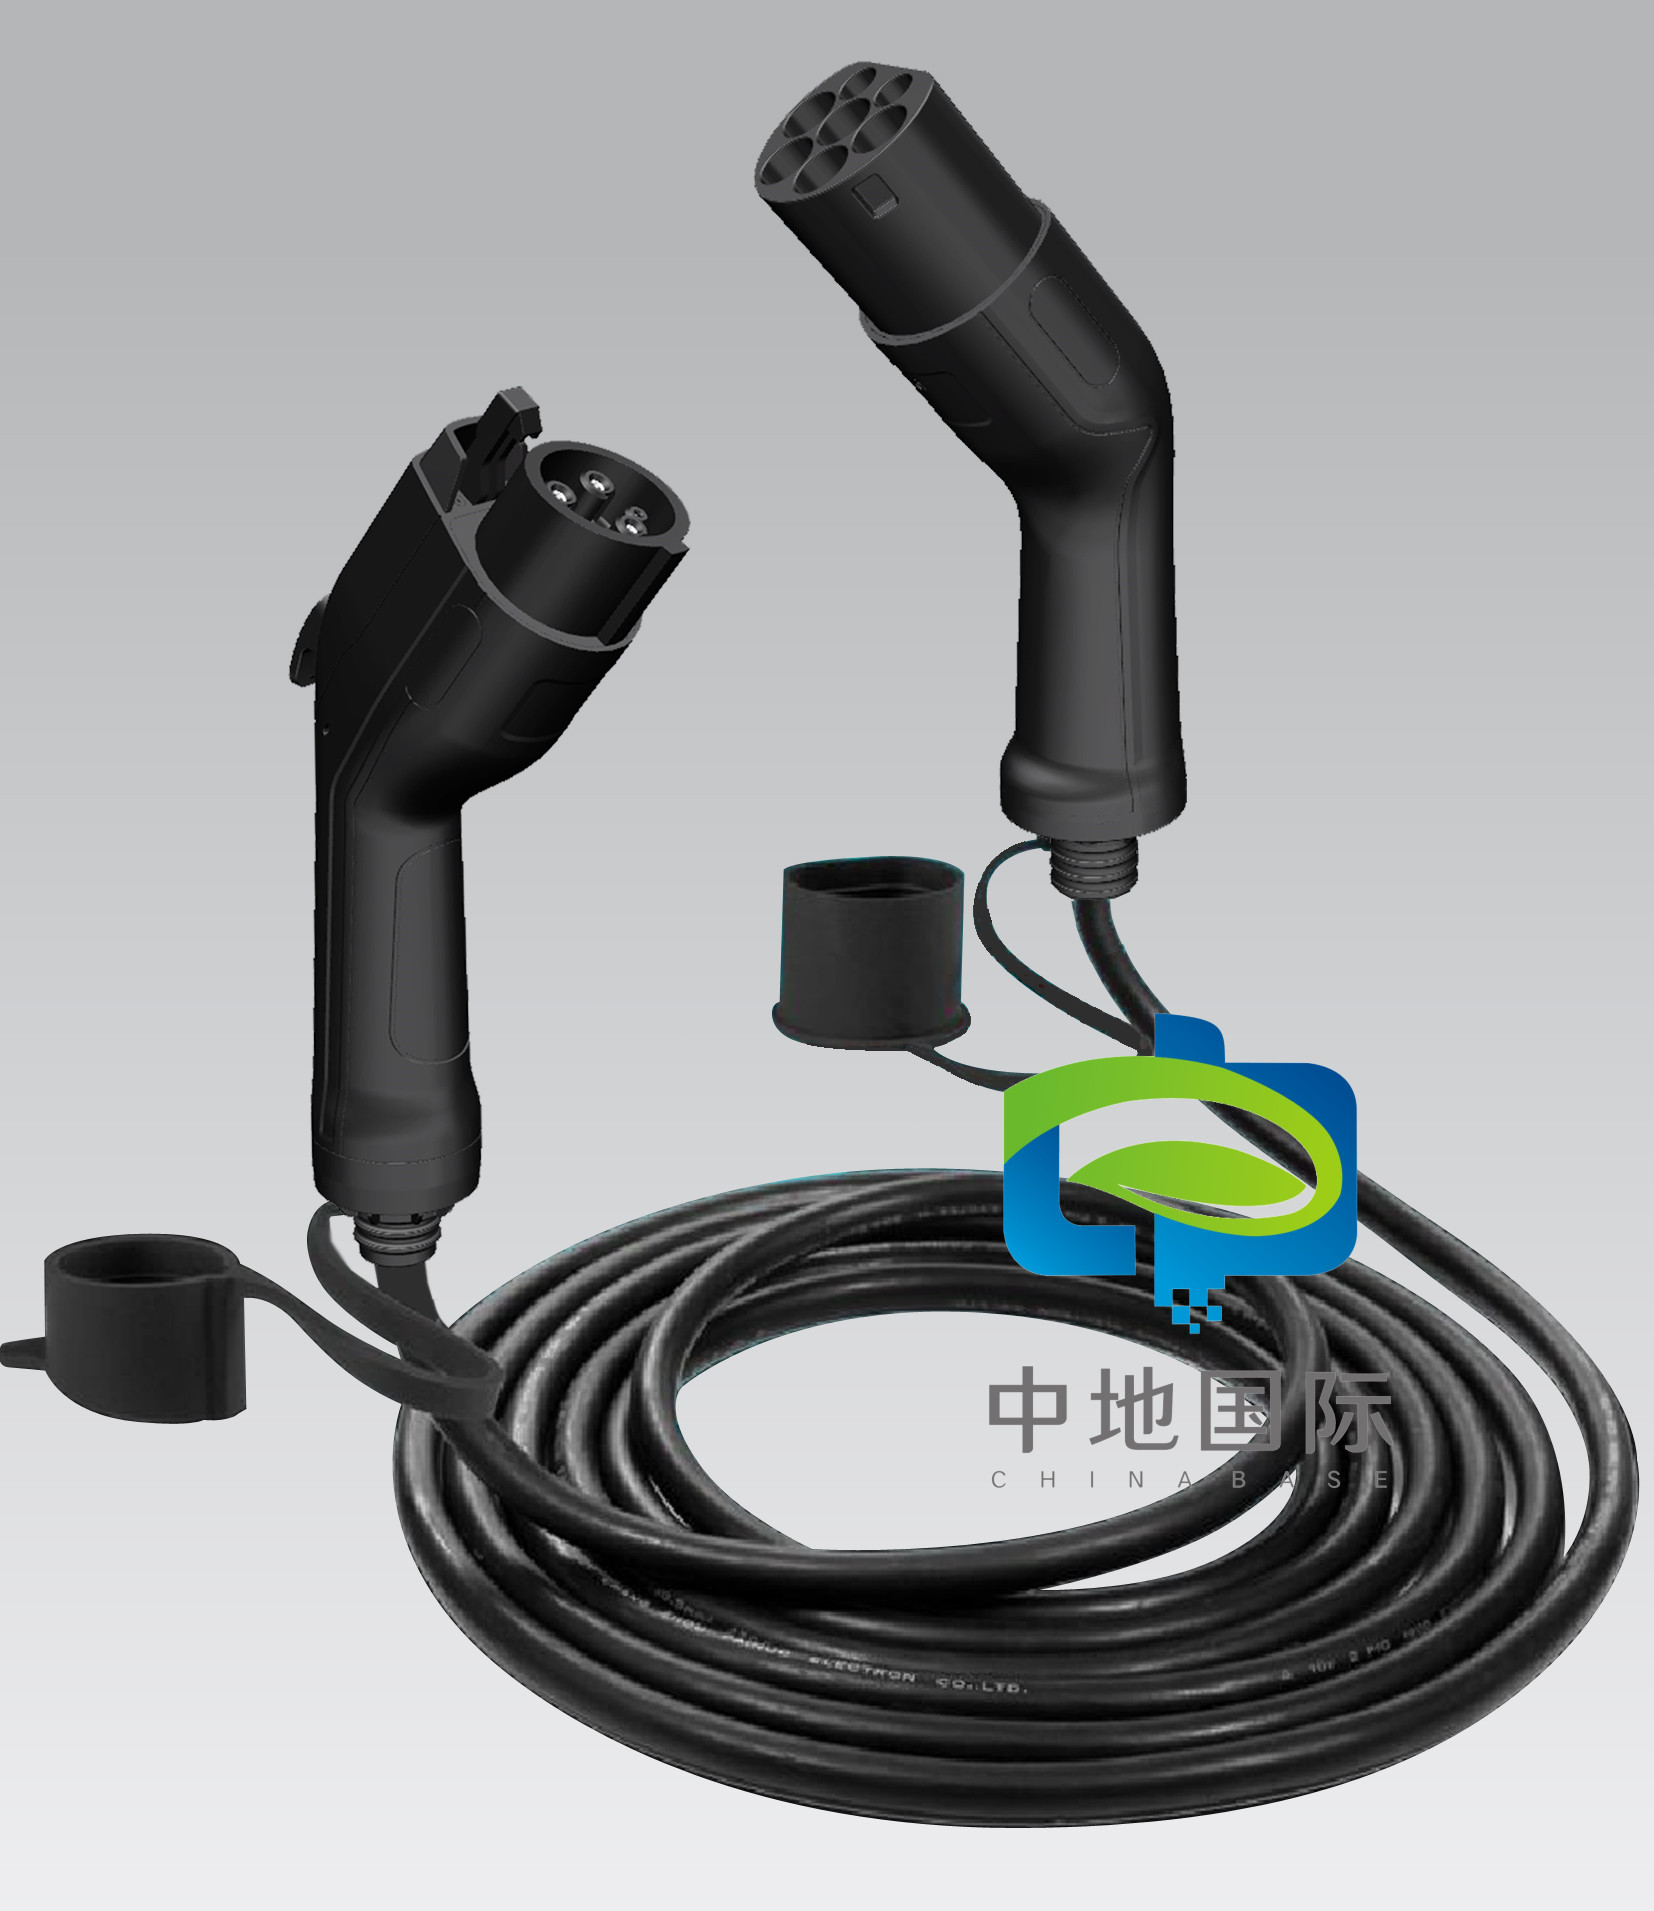 Electric vehicle supplement equipment